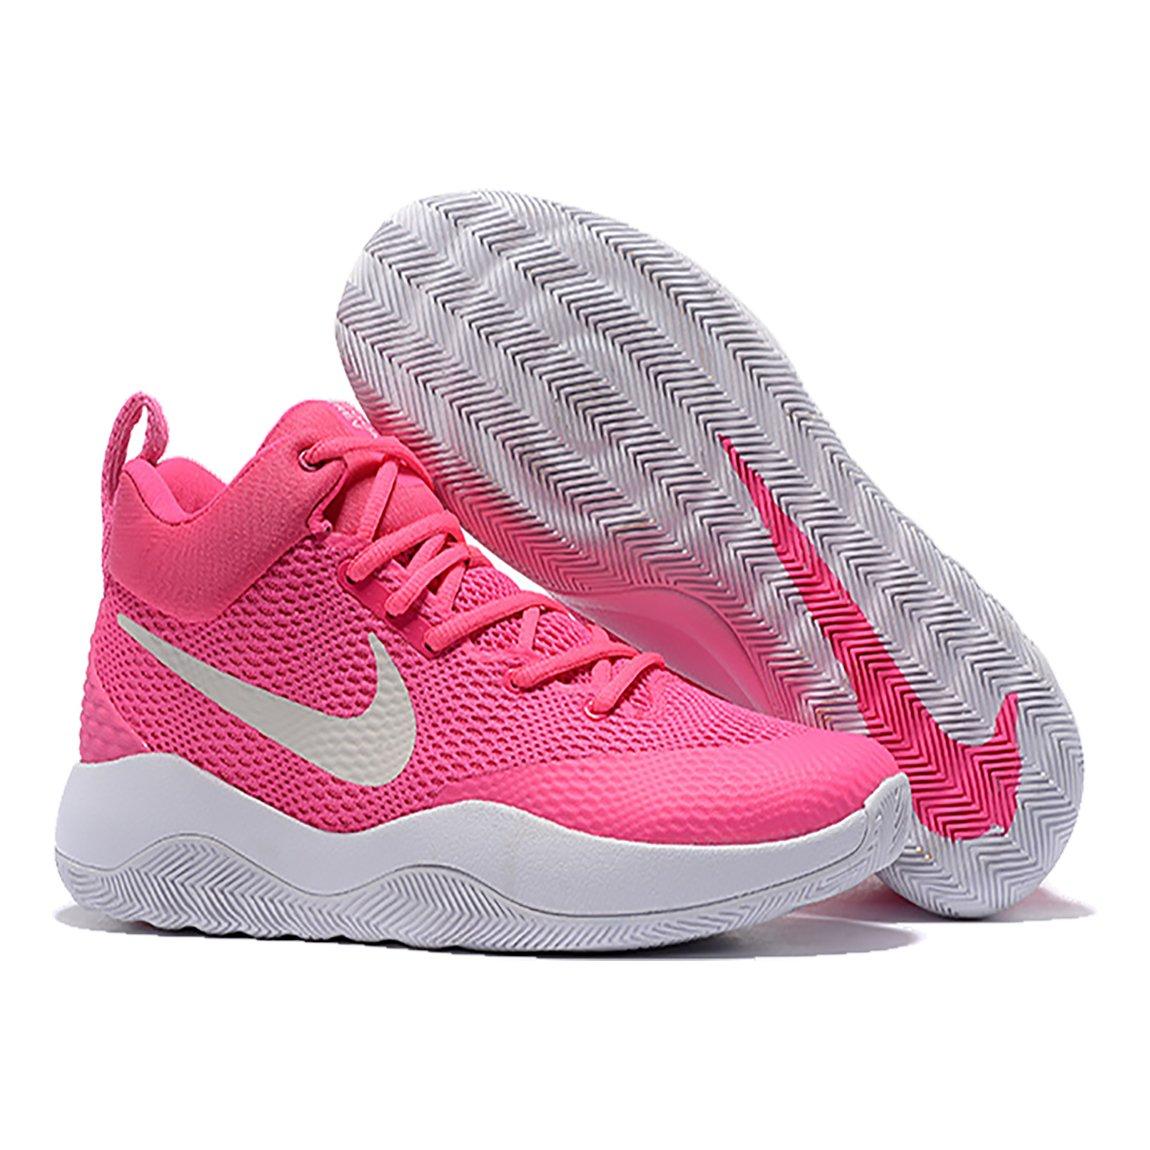 b298947a5bd1 Galleon - Nike Men s Zoom REV 2017 Mens Basketball-Shoes 852422 (12) Pink